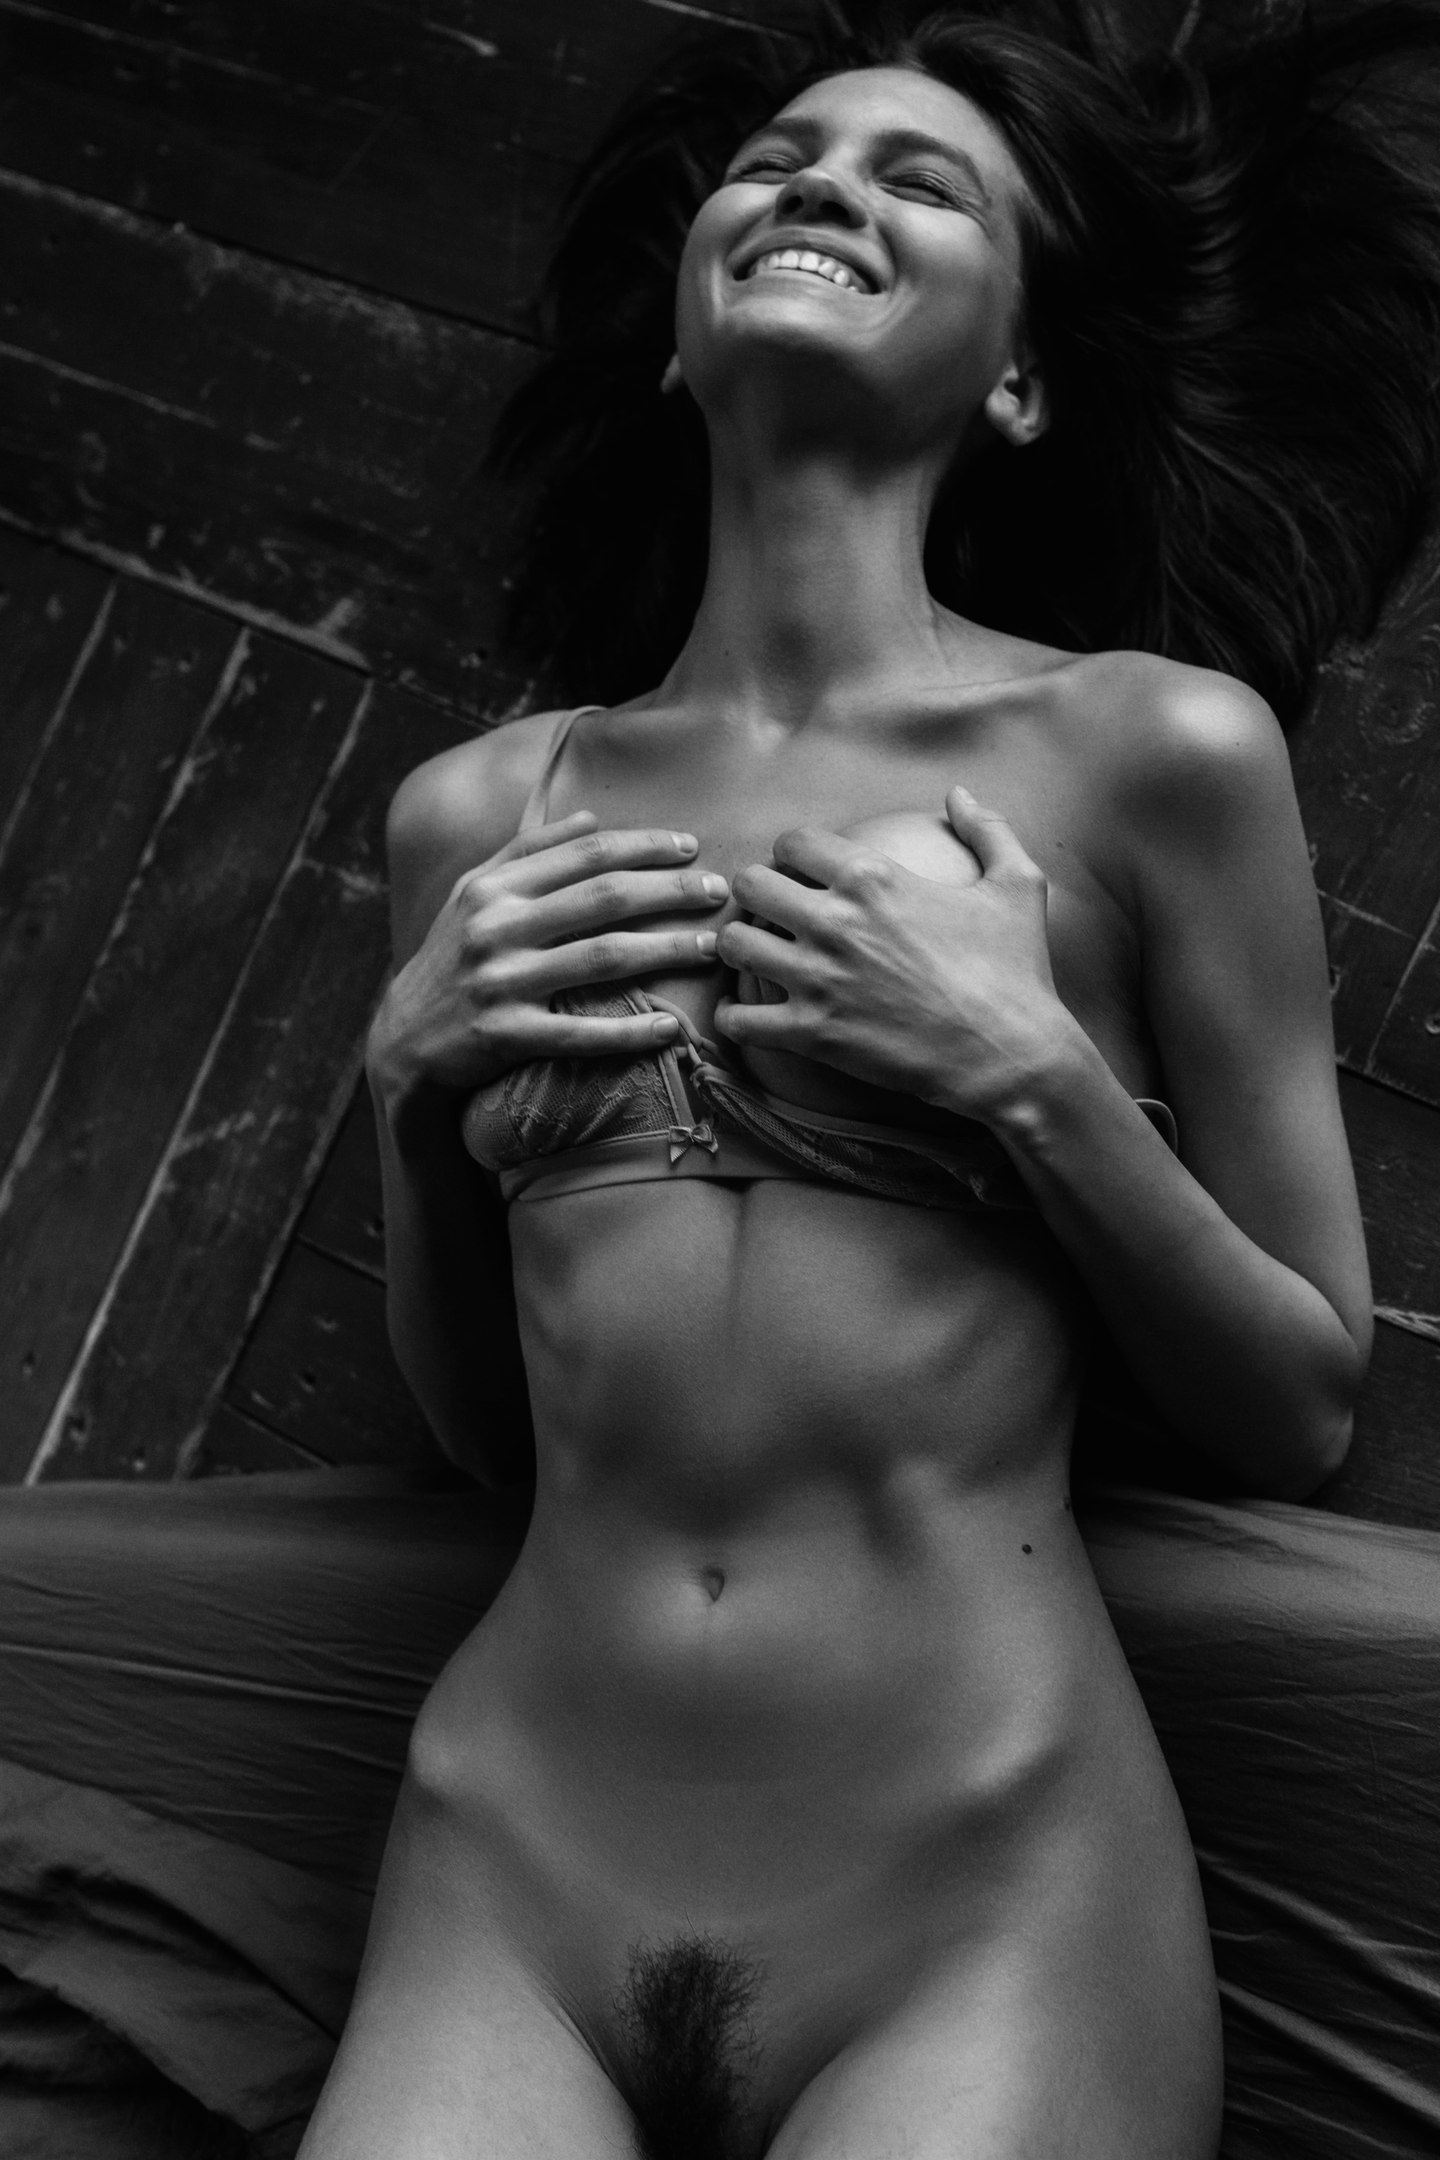 Мария Демина - фото Юра Ионов / Maria Demina by Yura Ionov